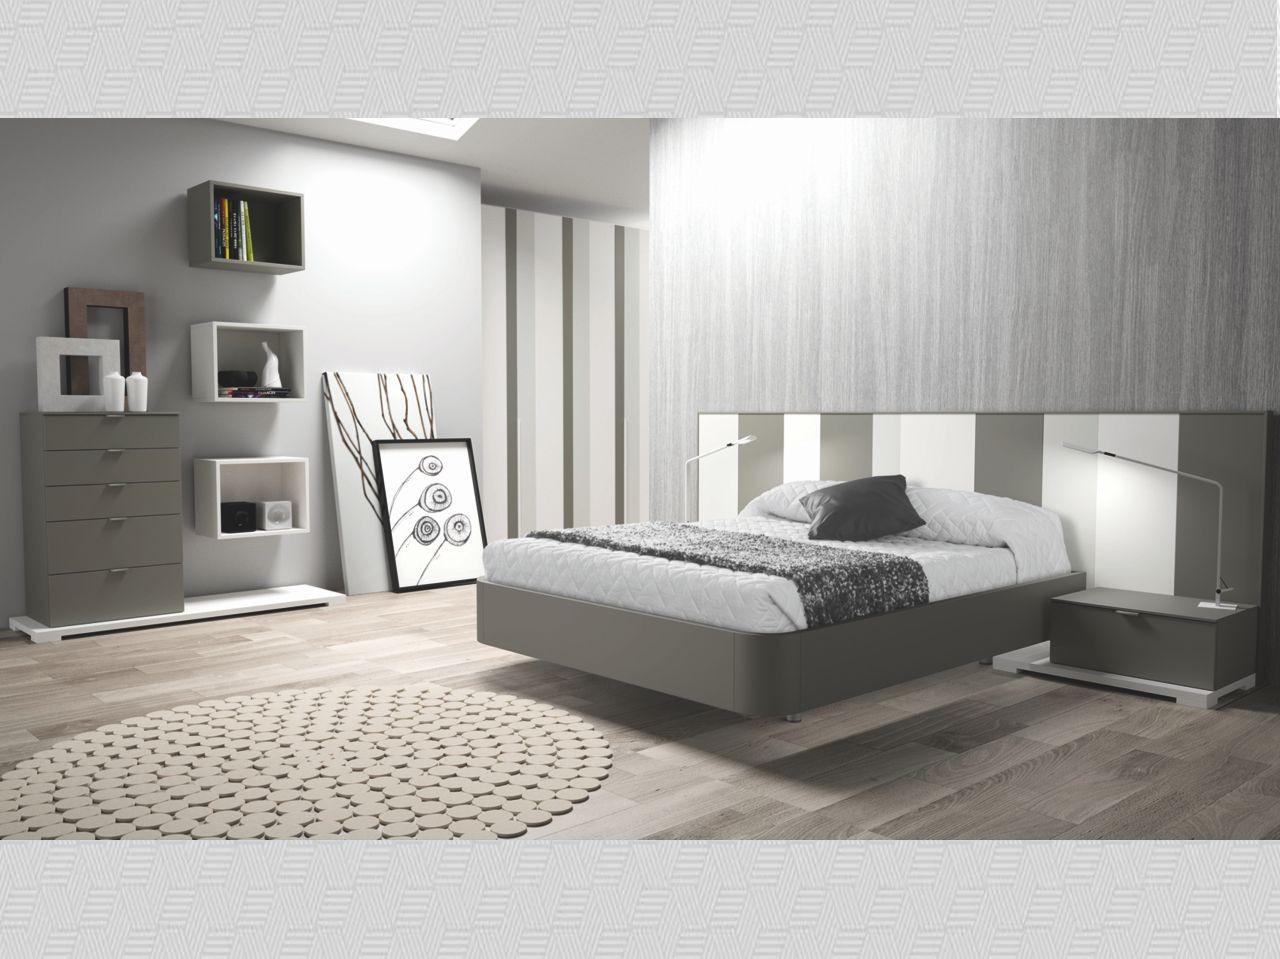 Dormitorio matrimonio antracita perla y blanco mate N08